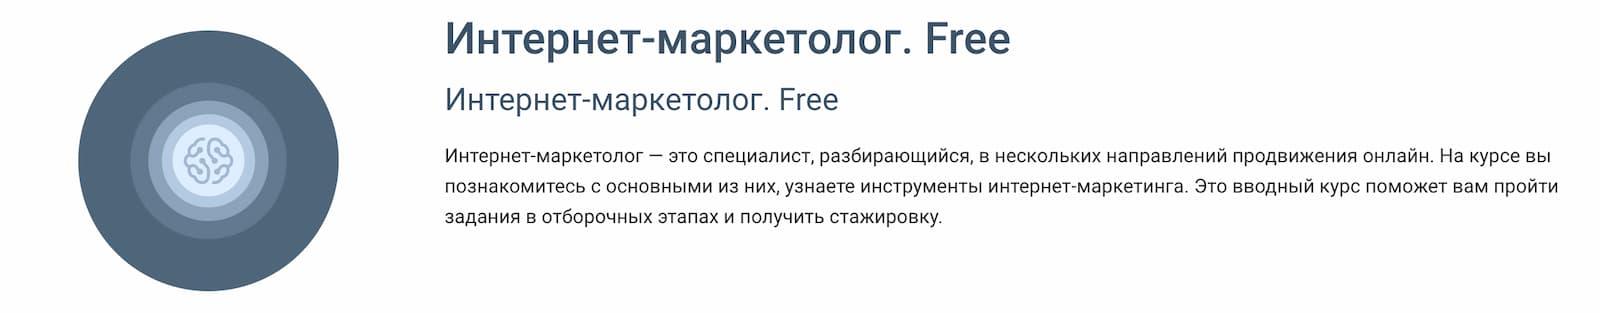 Записаться на курс «Интернет-маркетолог. Free» от GeekBrains